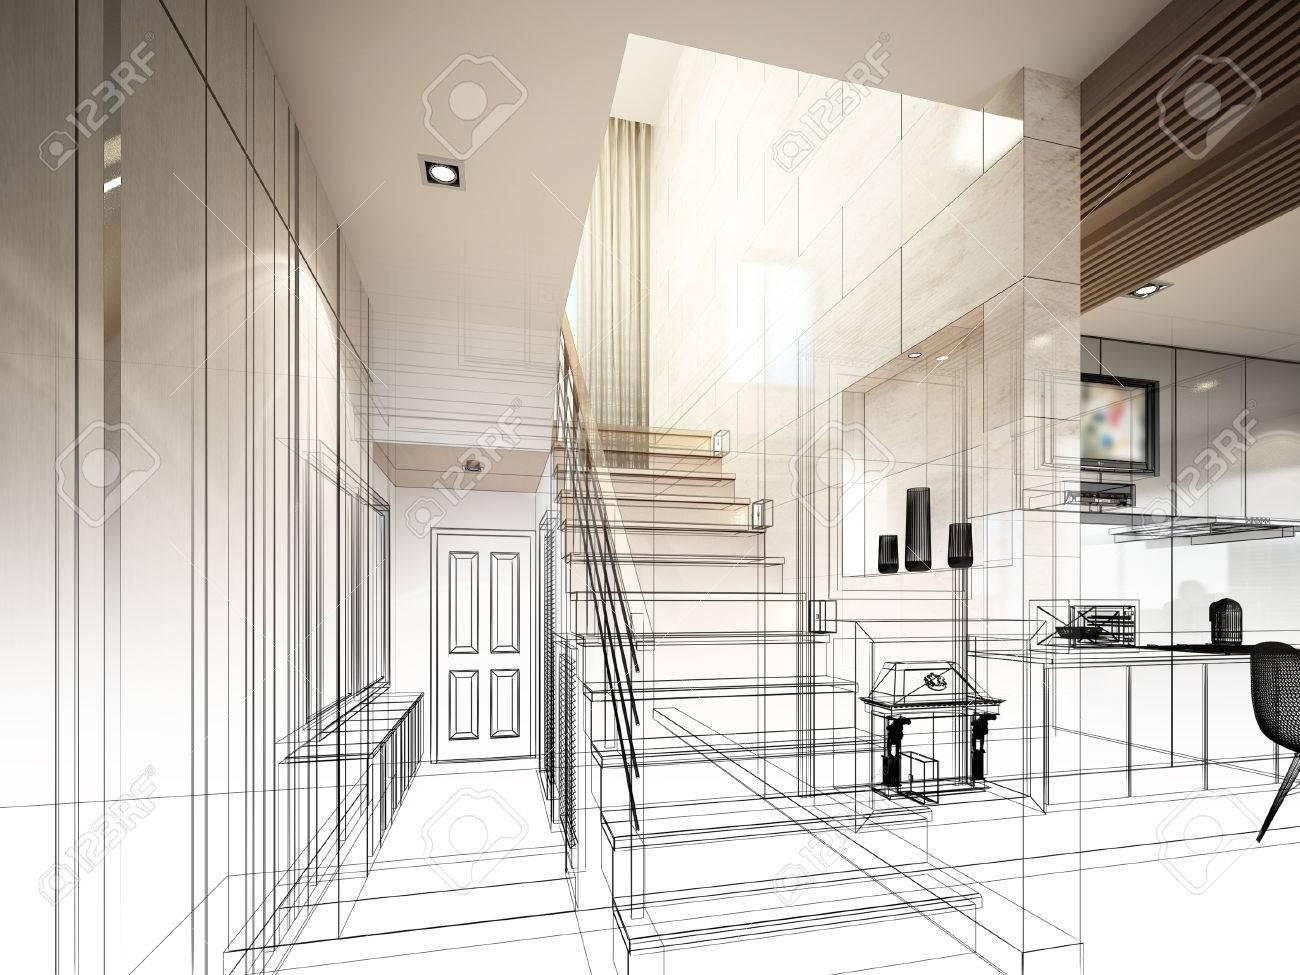 sketch design of stair hall 3dwire frame render - 40904835